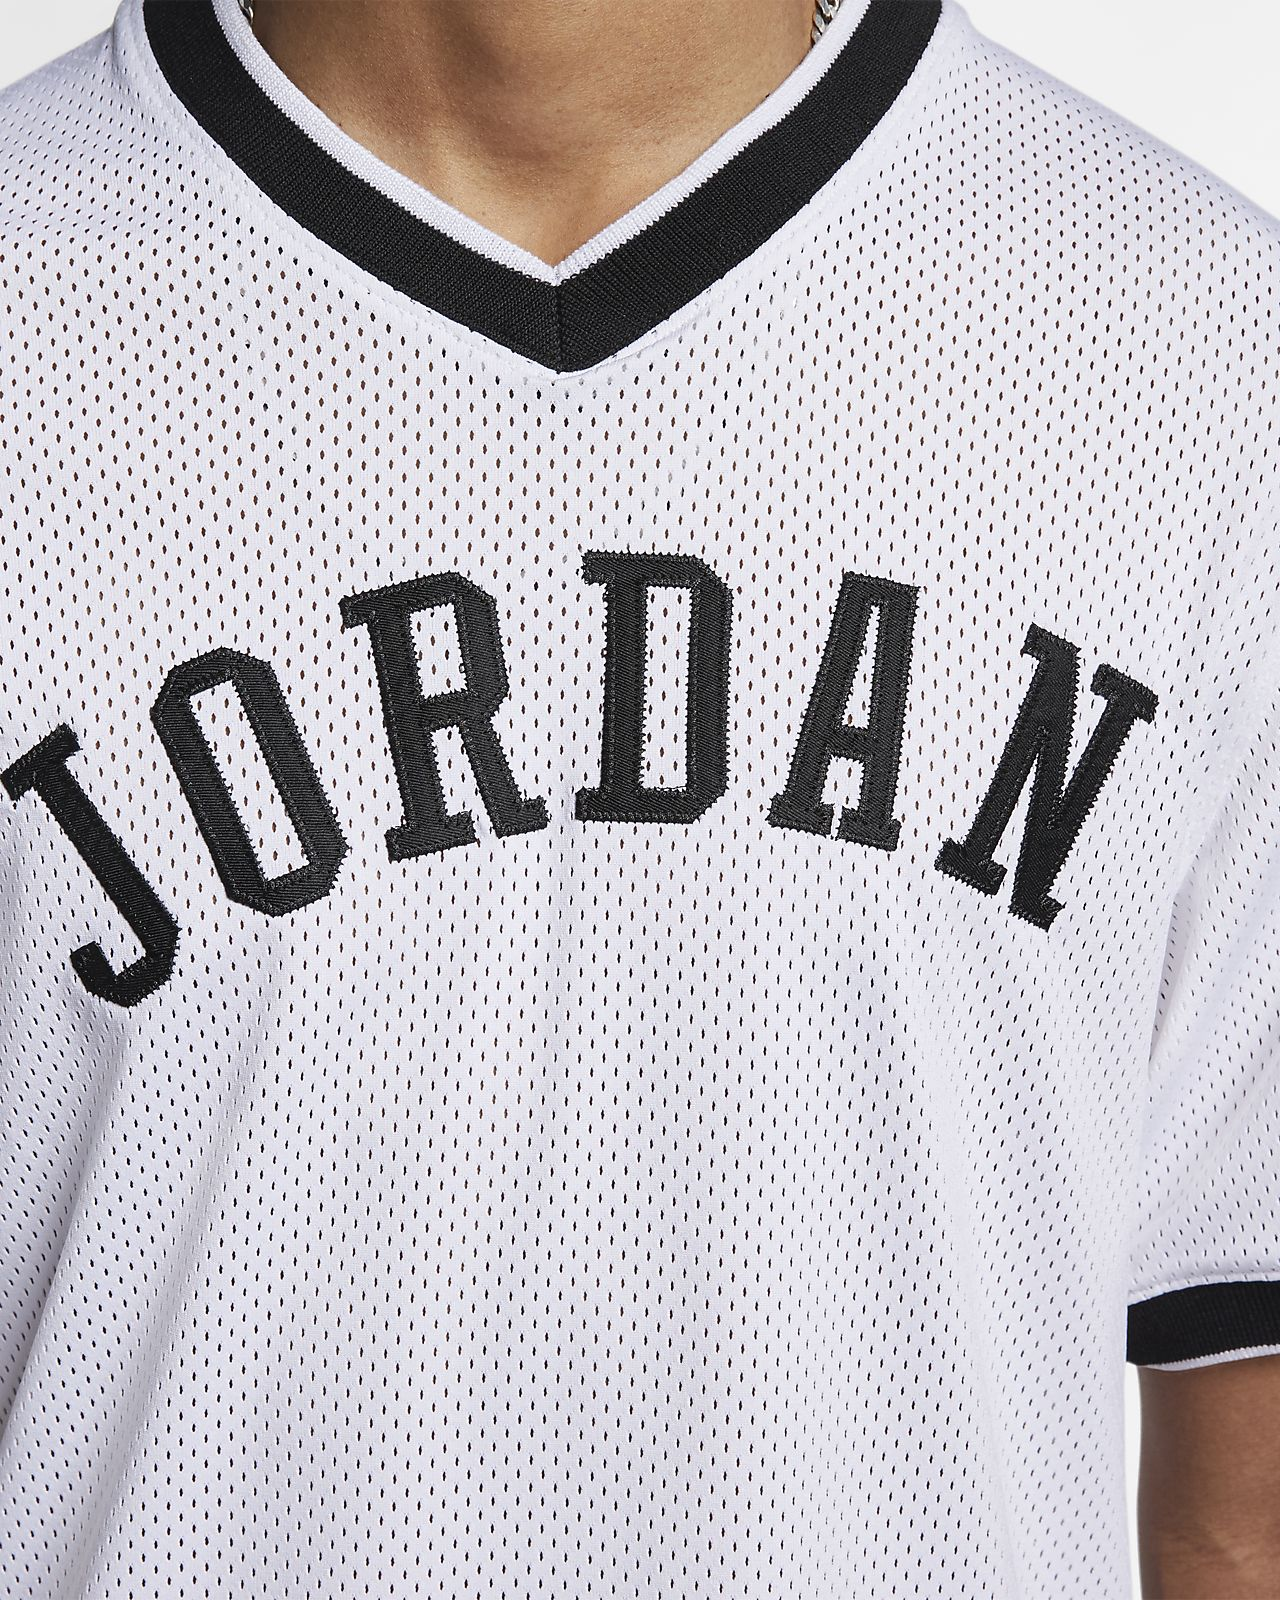 bbdebdf729e587 Jordan Jumpman Air Mesh Men s Basketball Jersey. Nike.com NZ